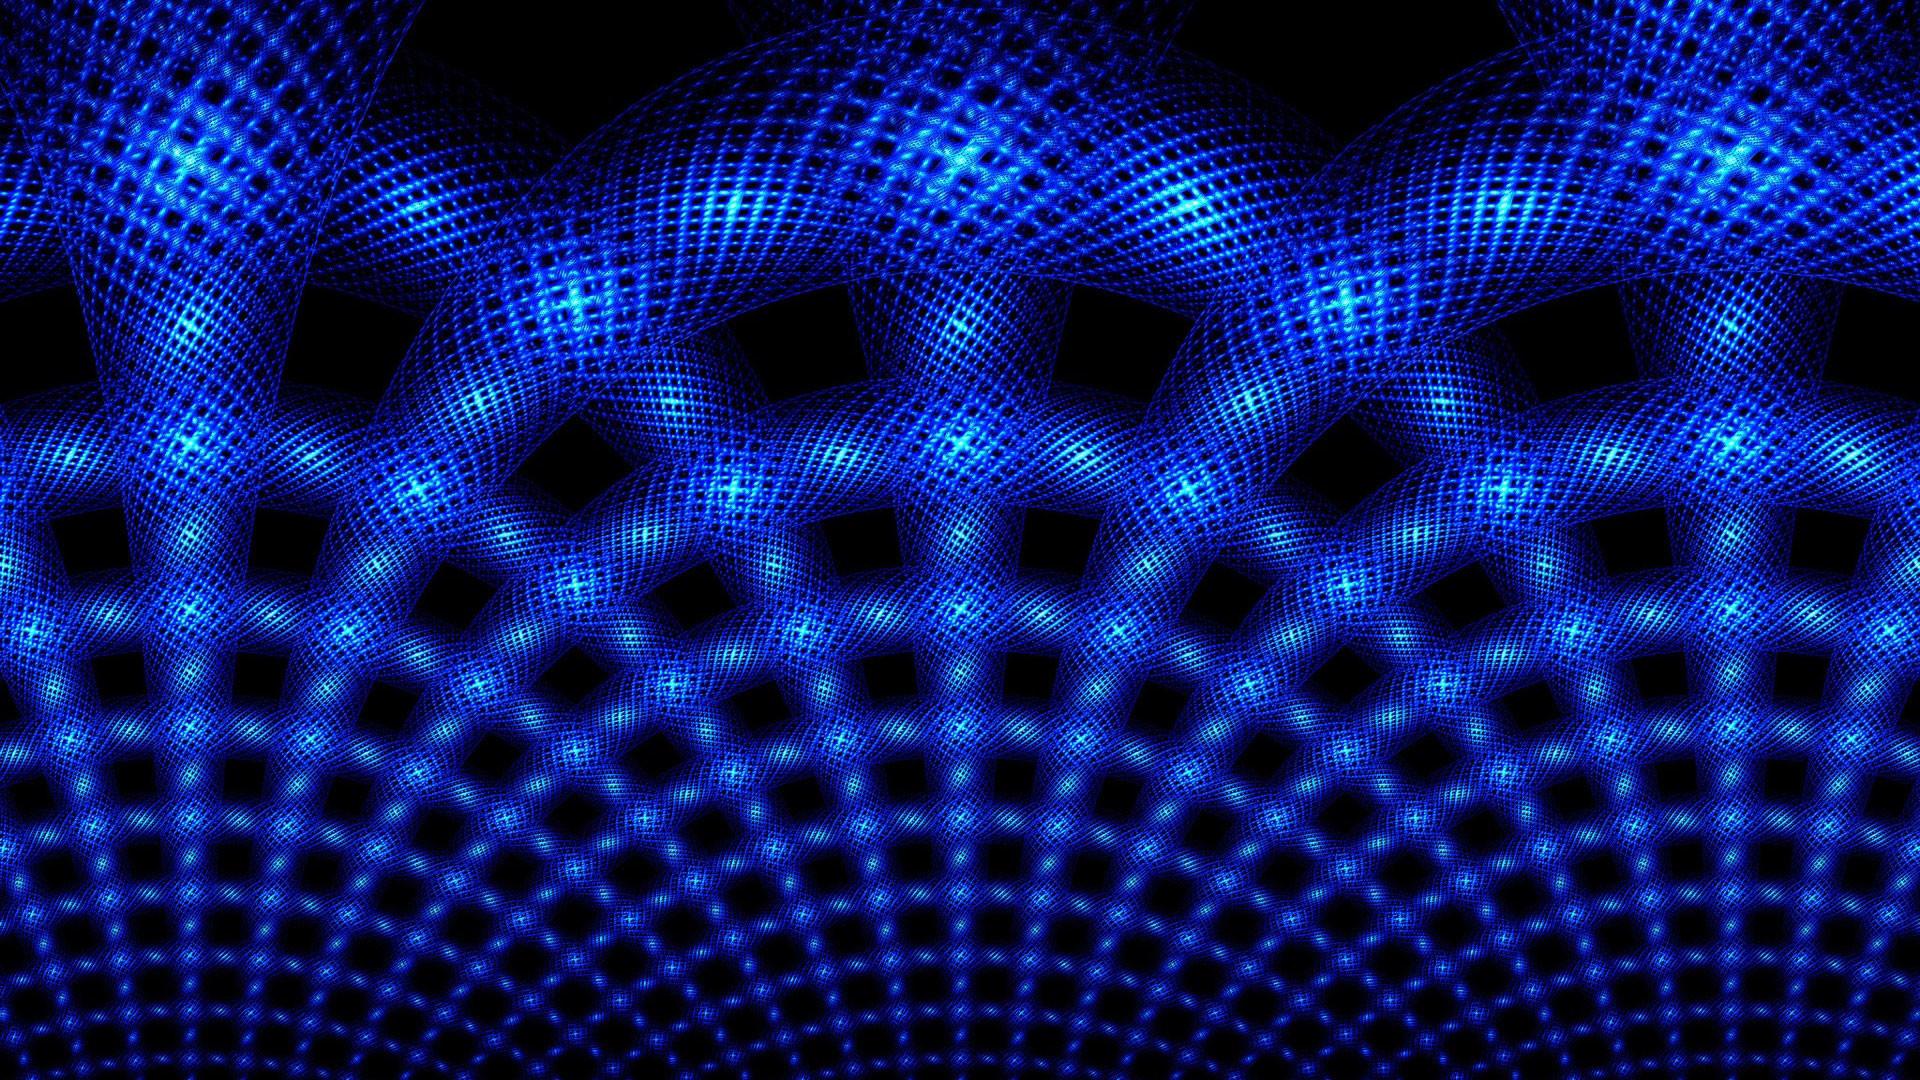 hd pics photos neon blue light glowing desktop background wallpaper